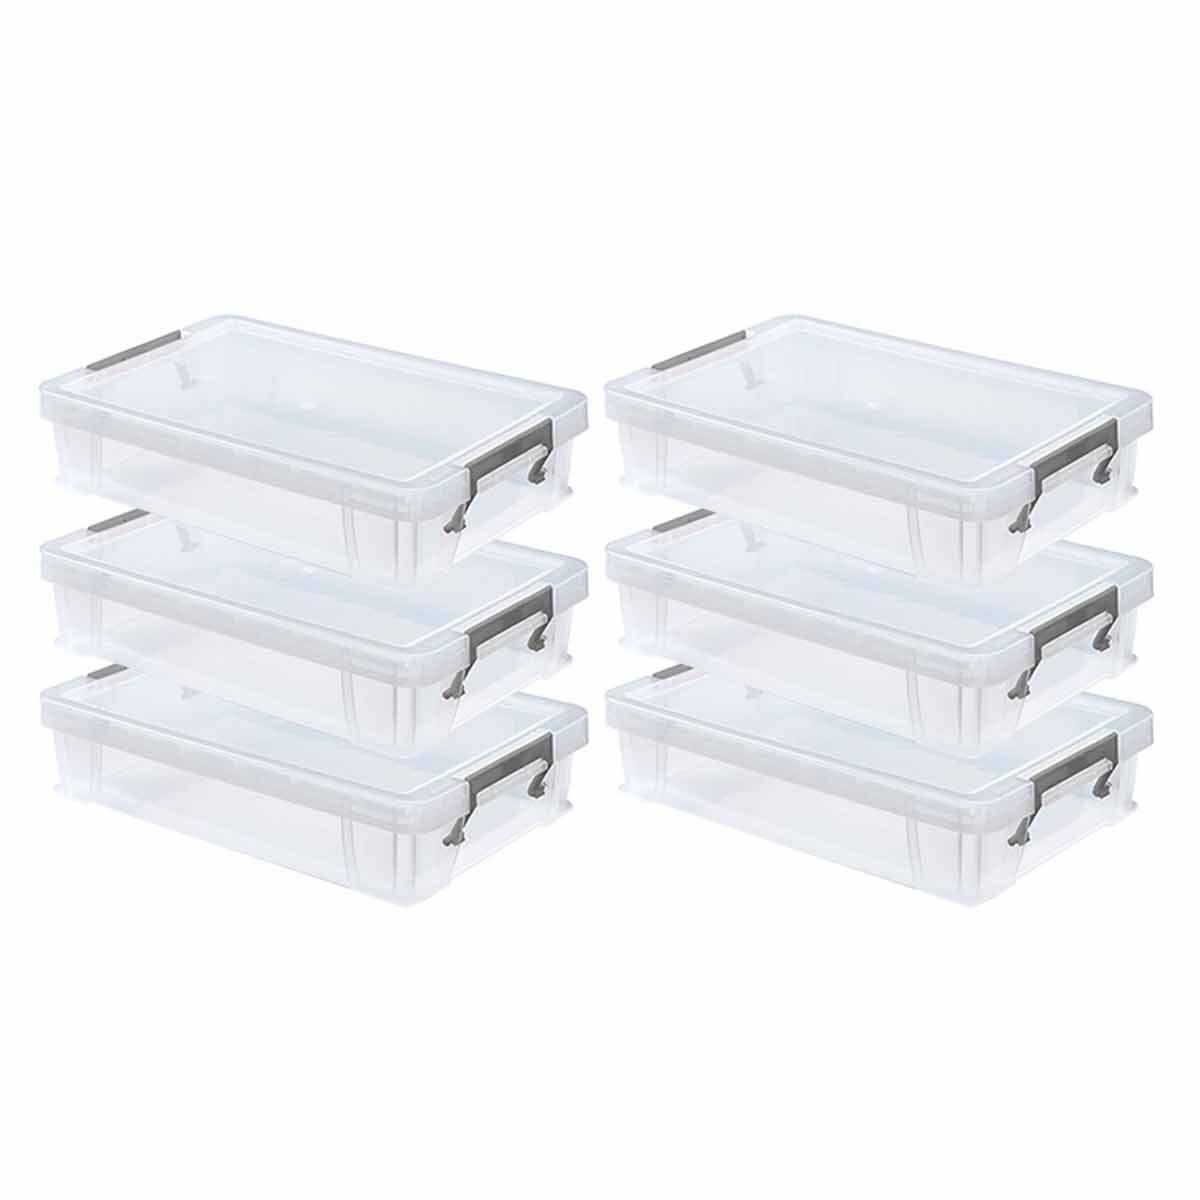 Whitefurze Allstore Plastic Storage Box 5.5 Litre Pack of 6